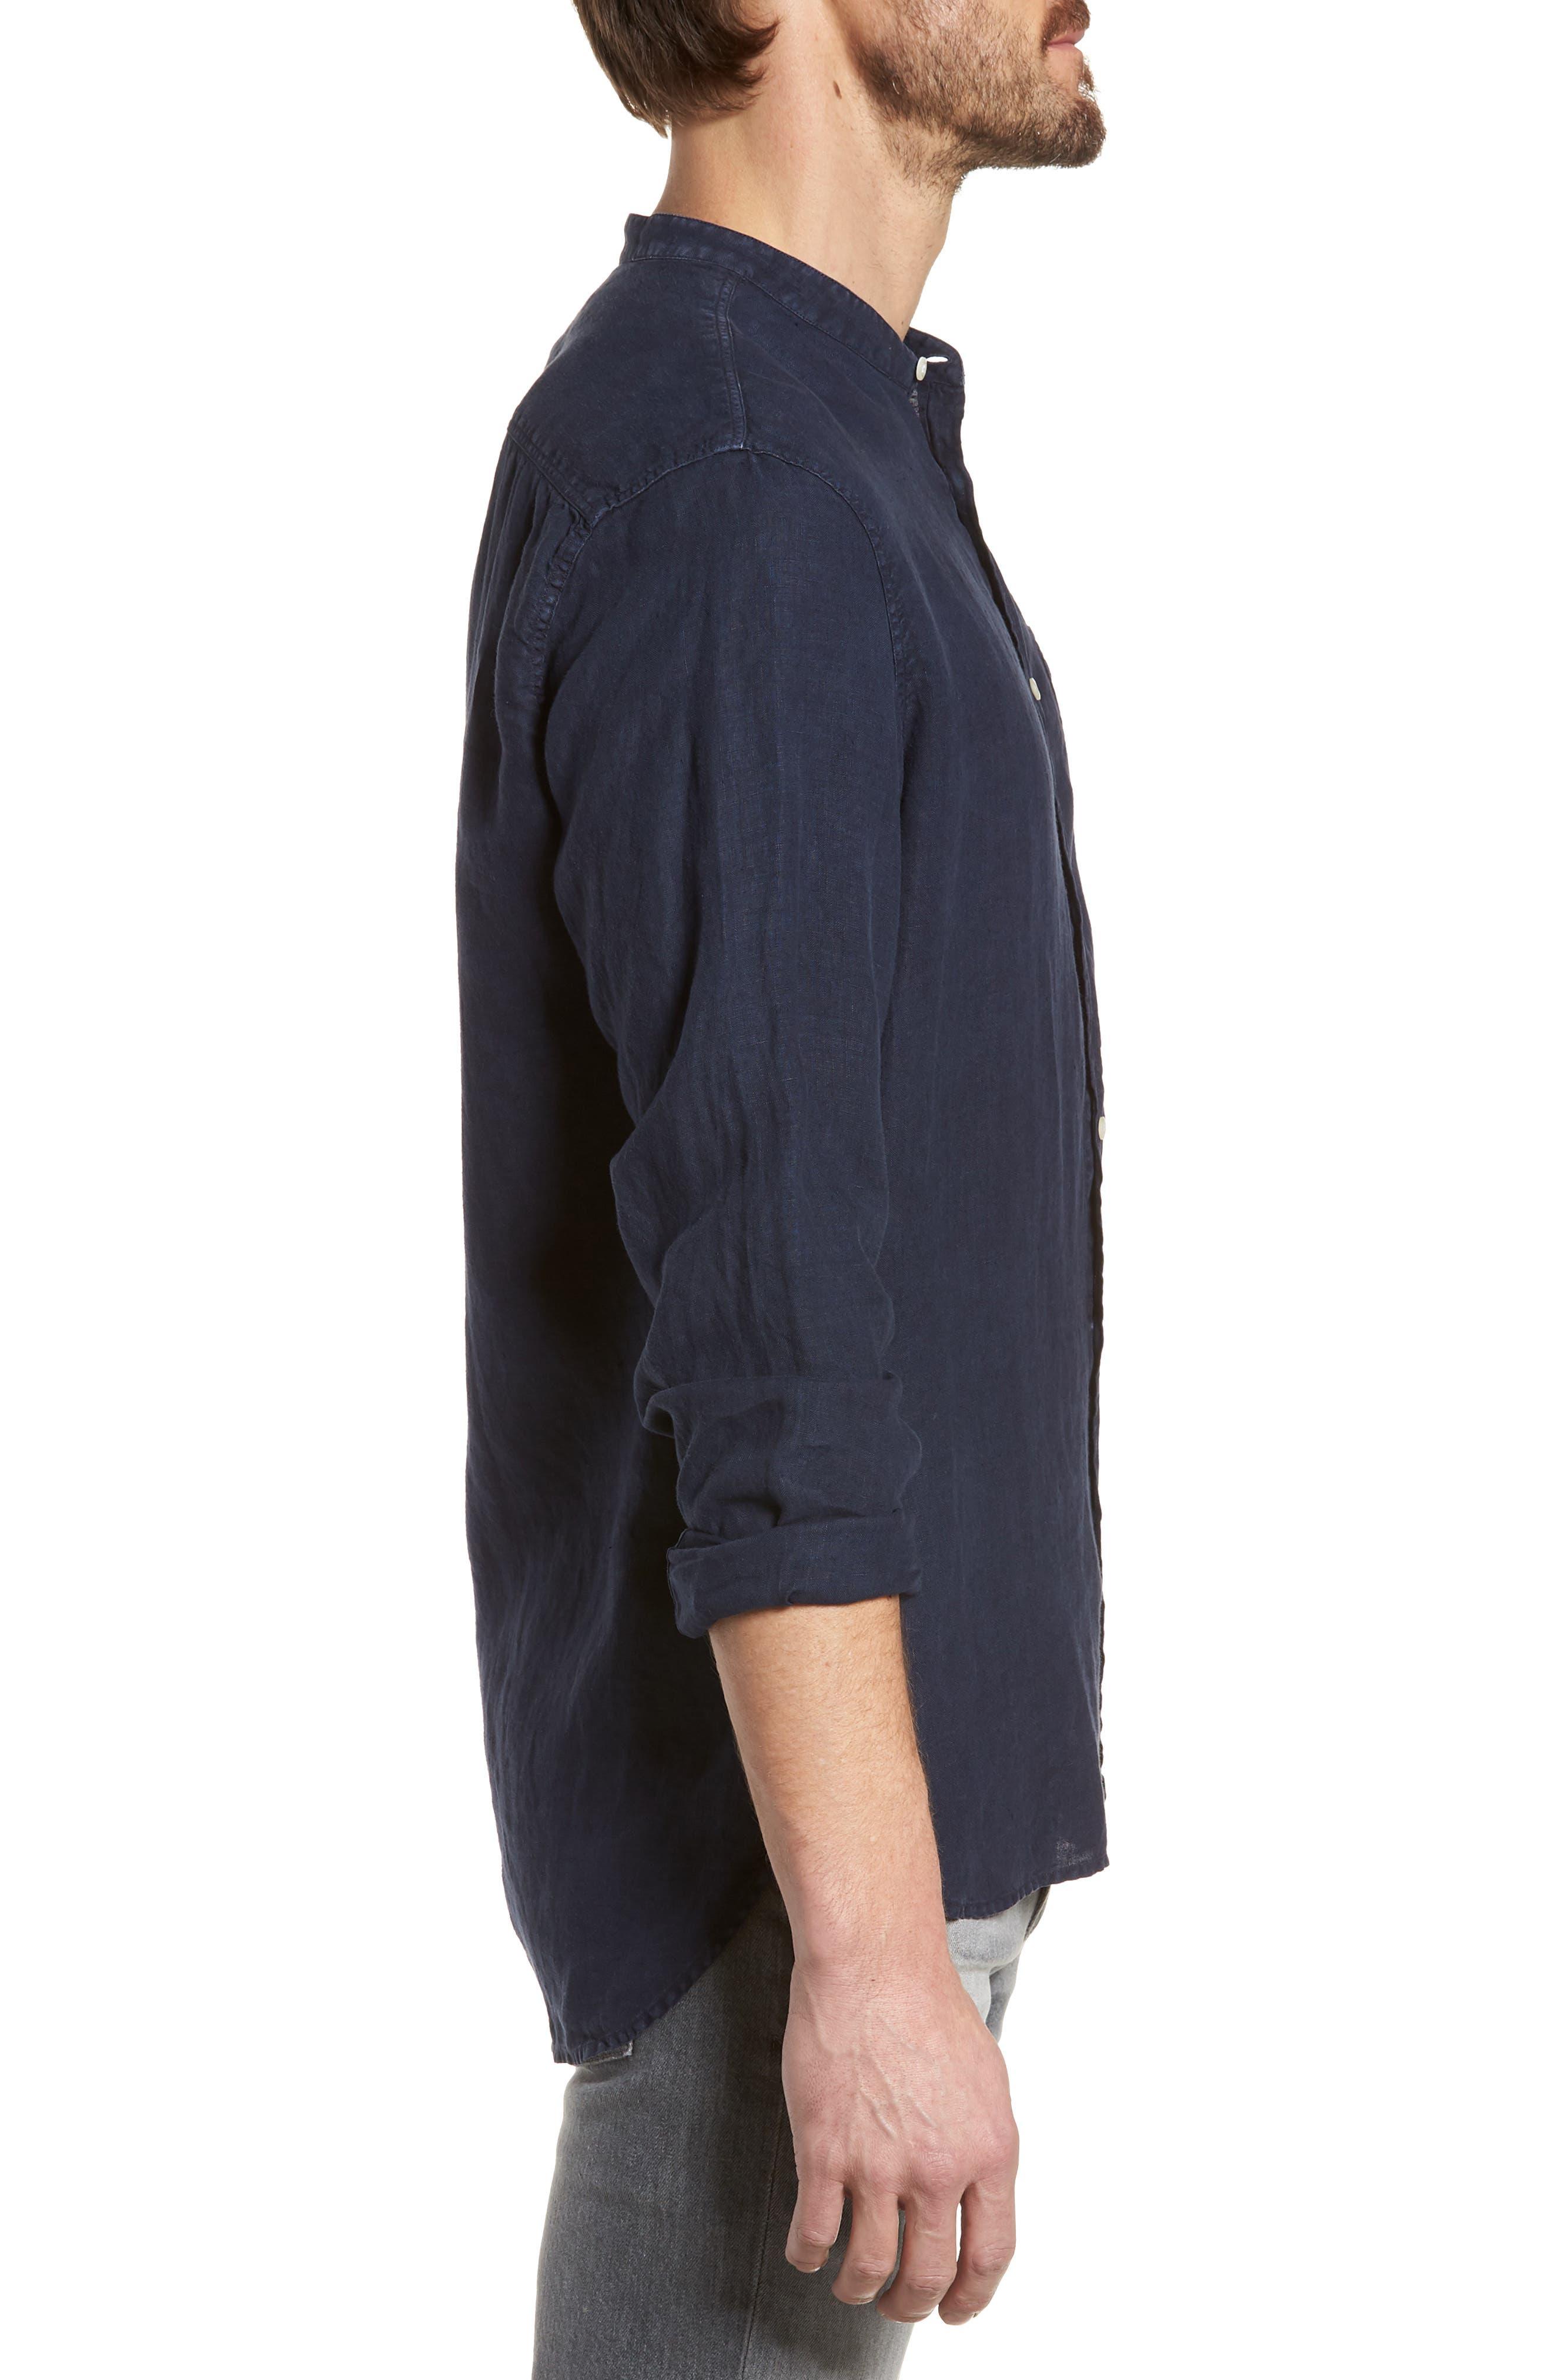 & Bros. Regular Fit Band Collar Linen Shirt,                             Alternate thumbnail 3, color,                             Mood Indigo